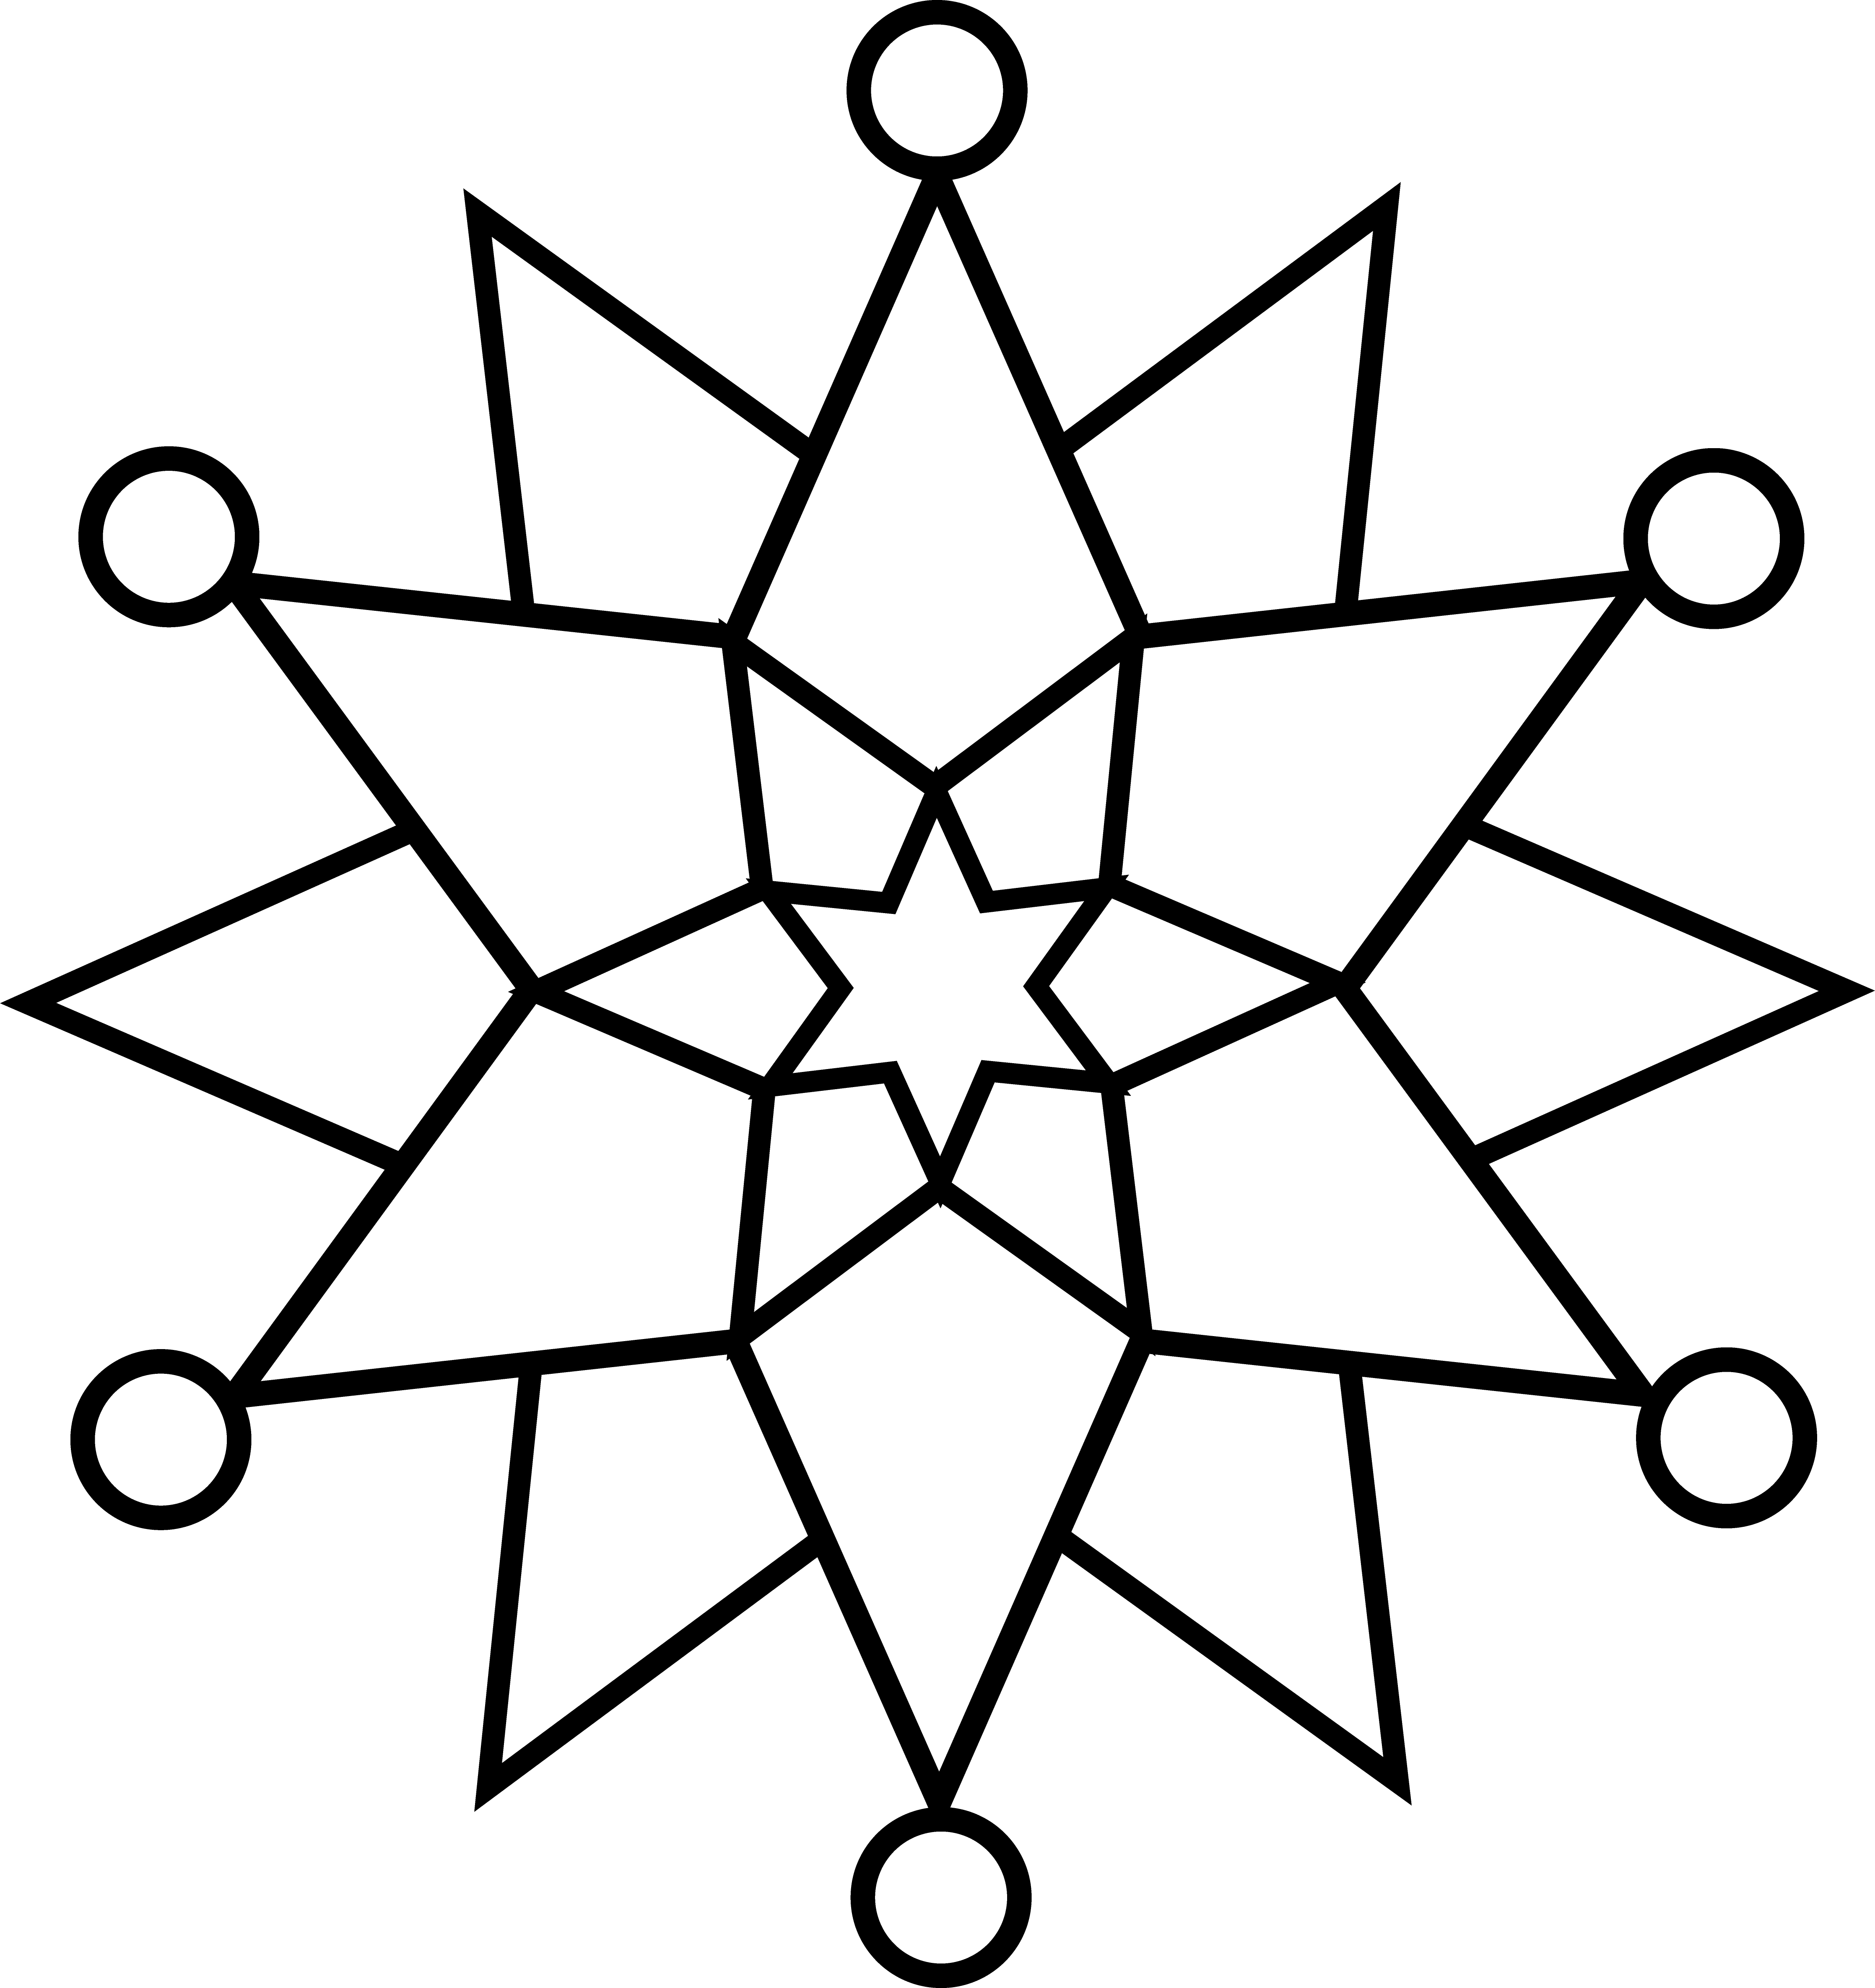 Black and White Snowflake   design   Pinterest   Snowflake pattern ...